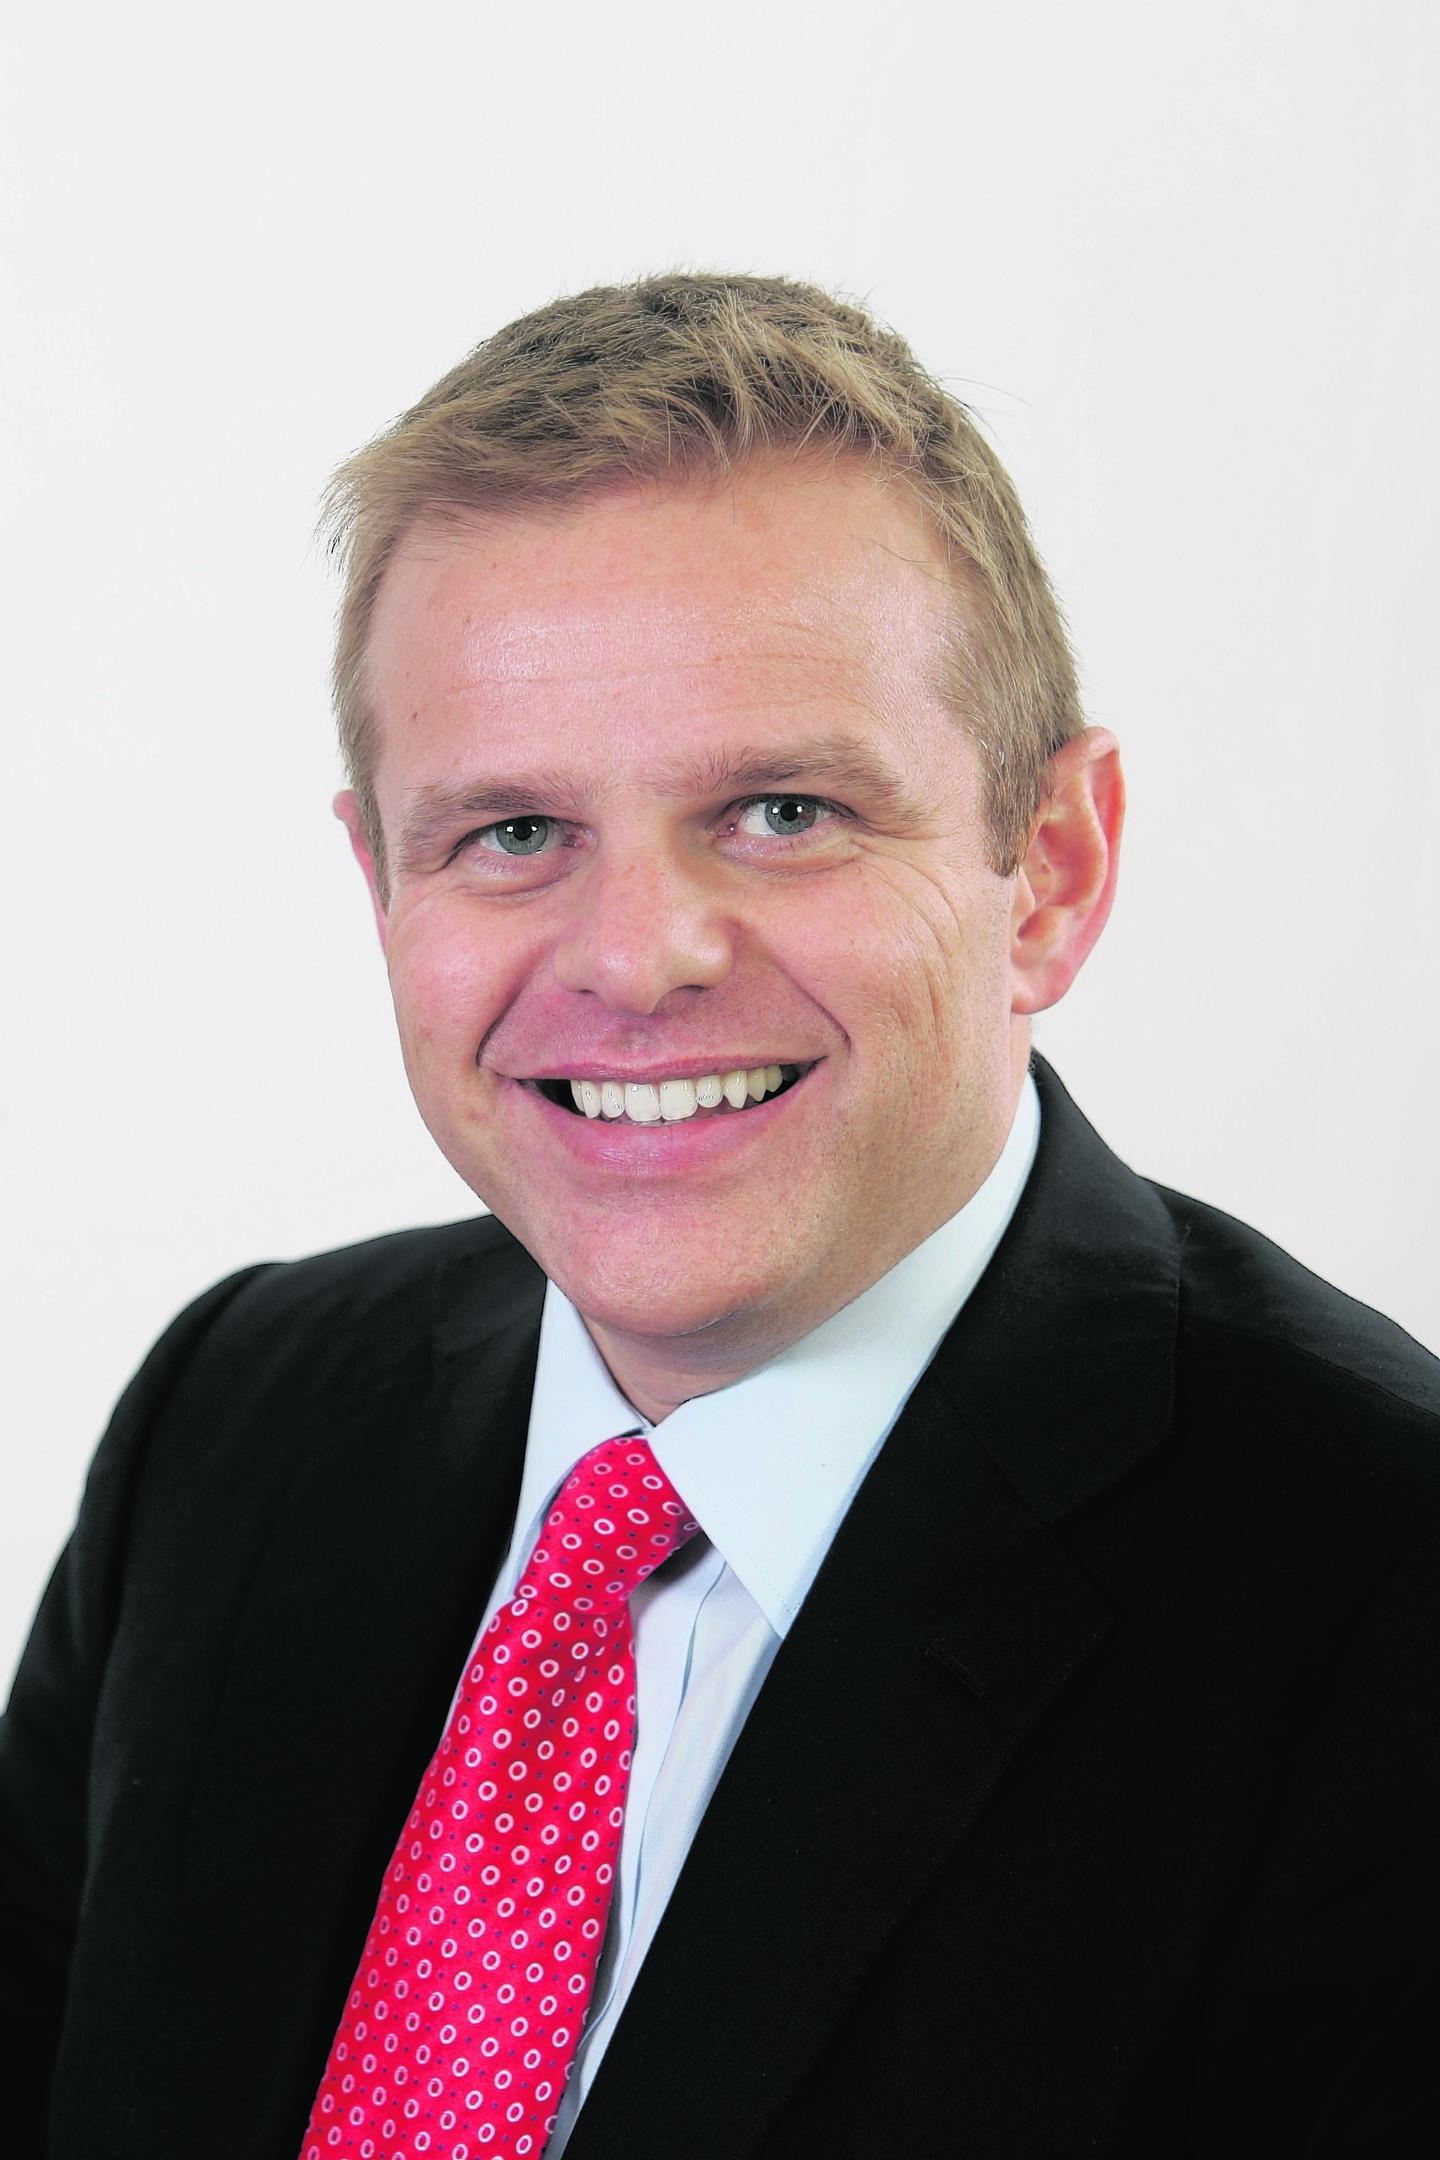 David Glen, head of tax at PricewaterhouseCoopers